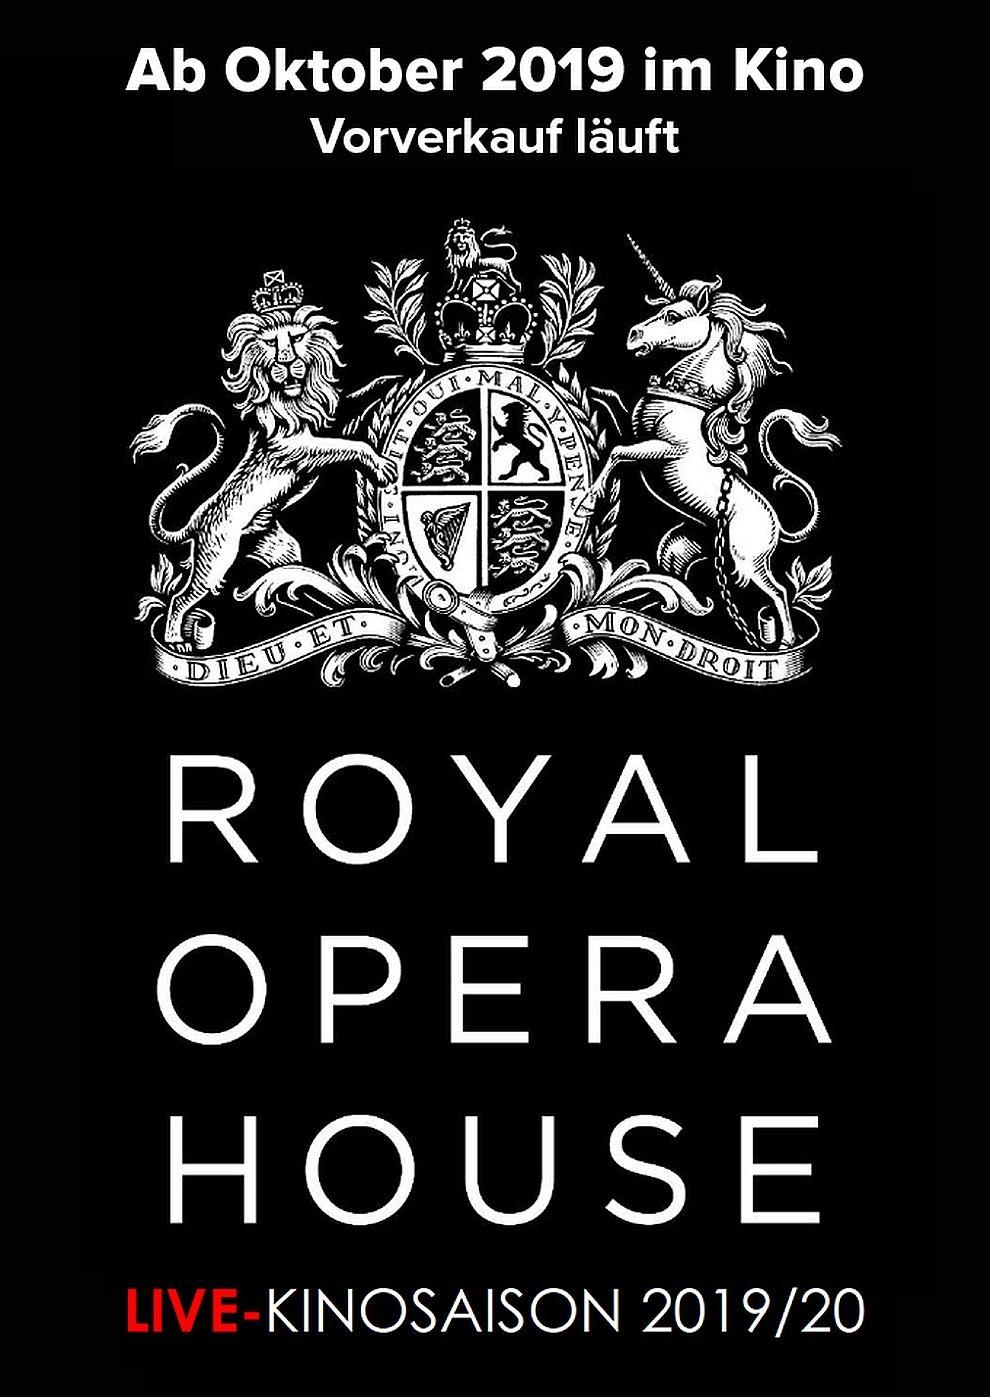 Royal Opera House 2019/20: Schwanensee (Poster)